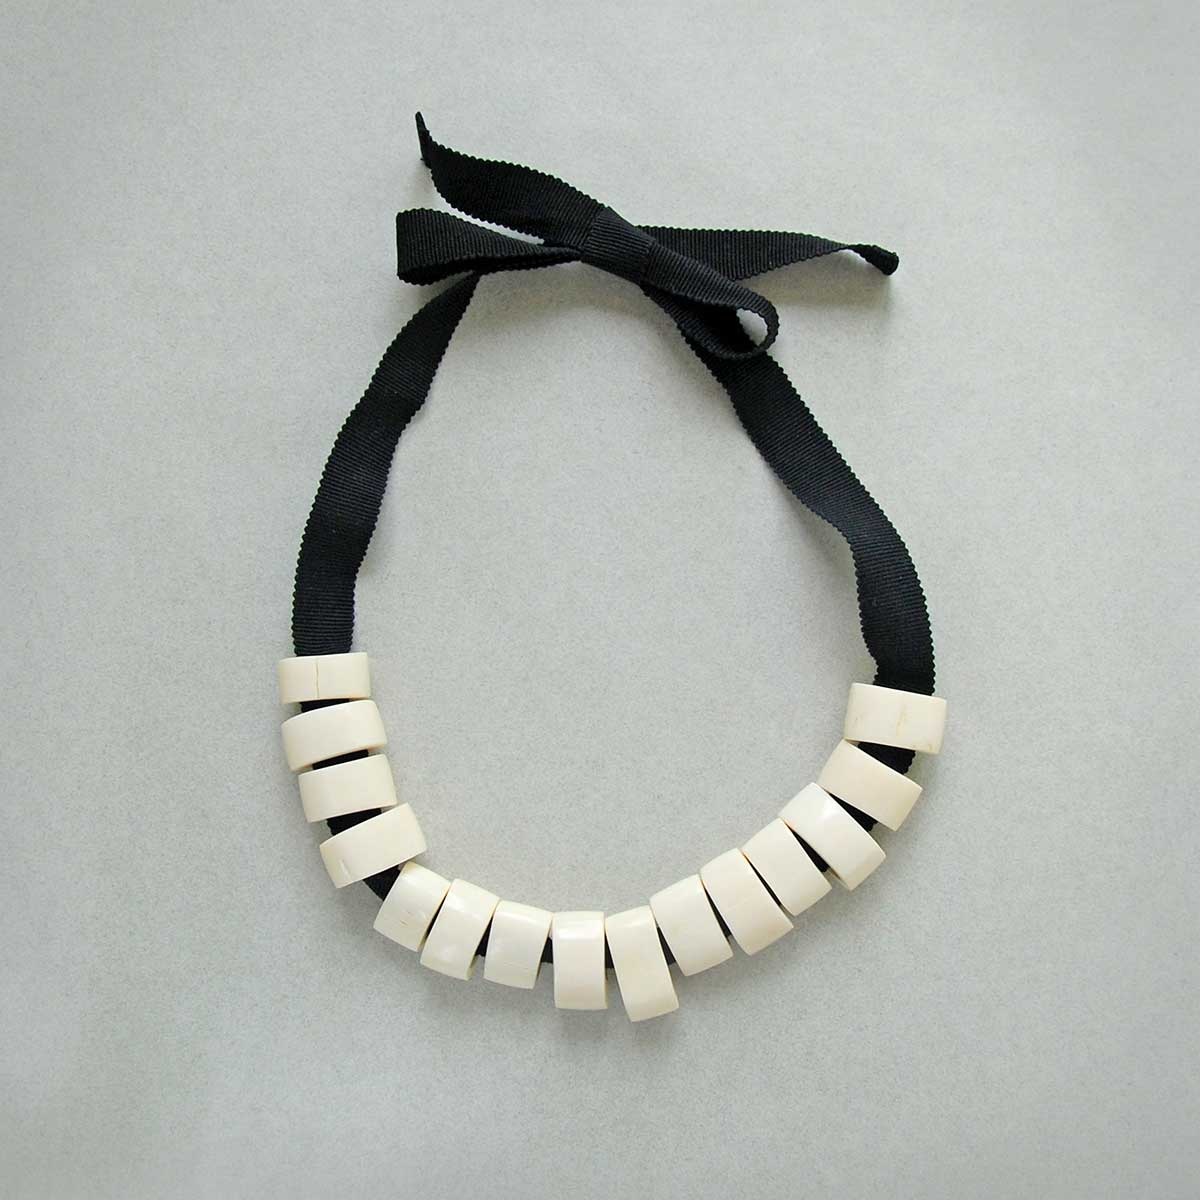 Bone-necklace-01-1200x1200